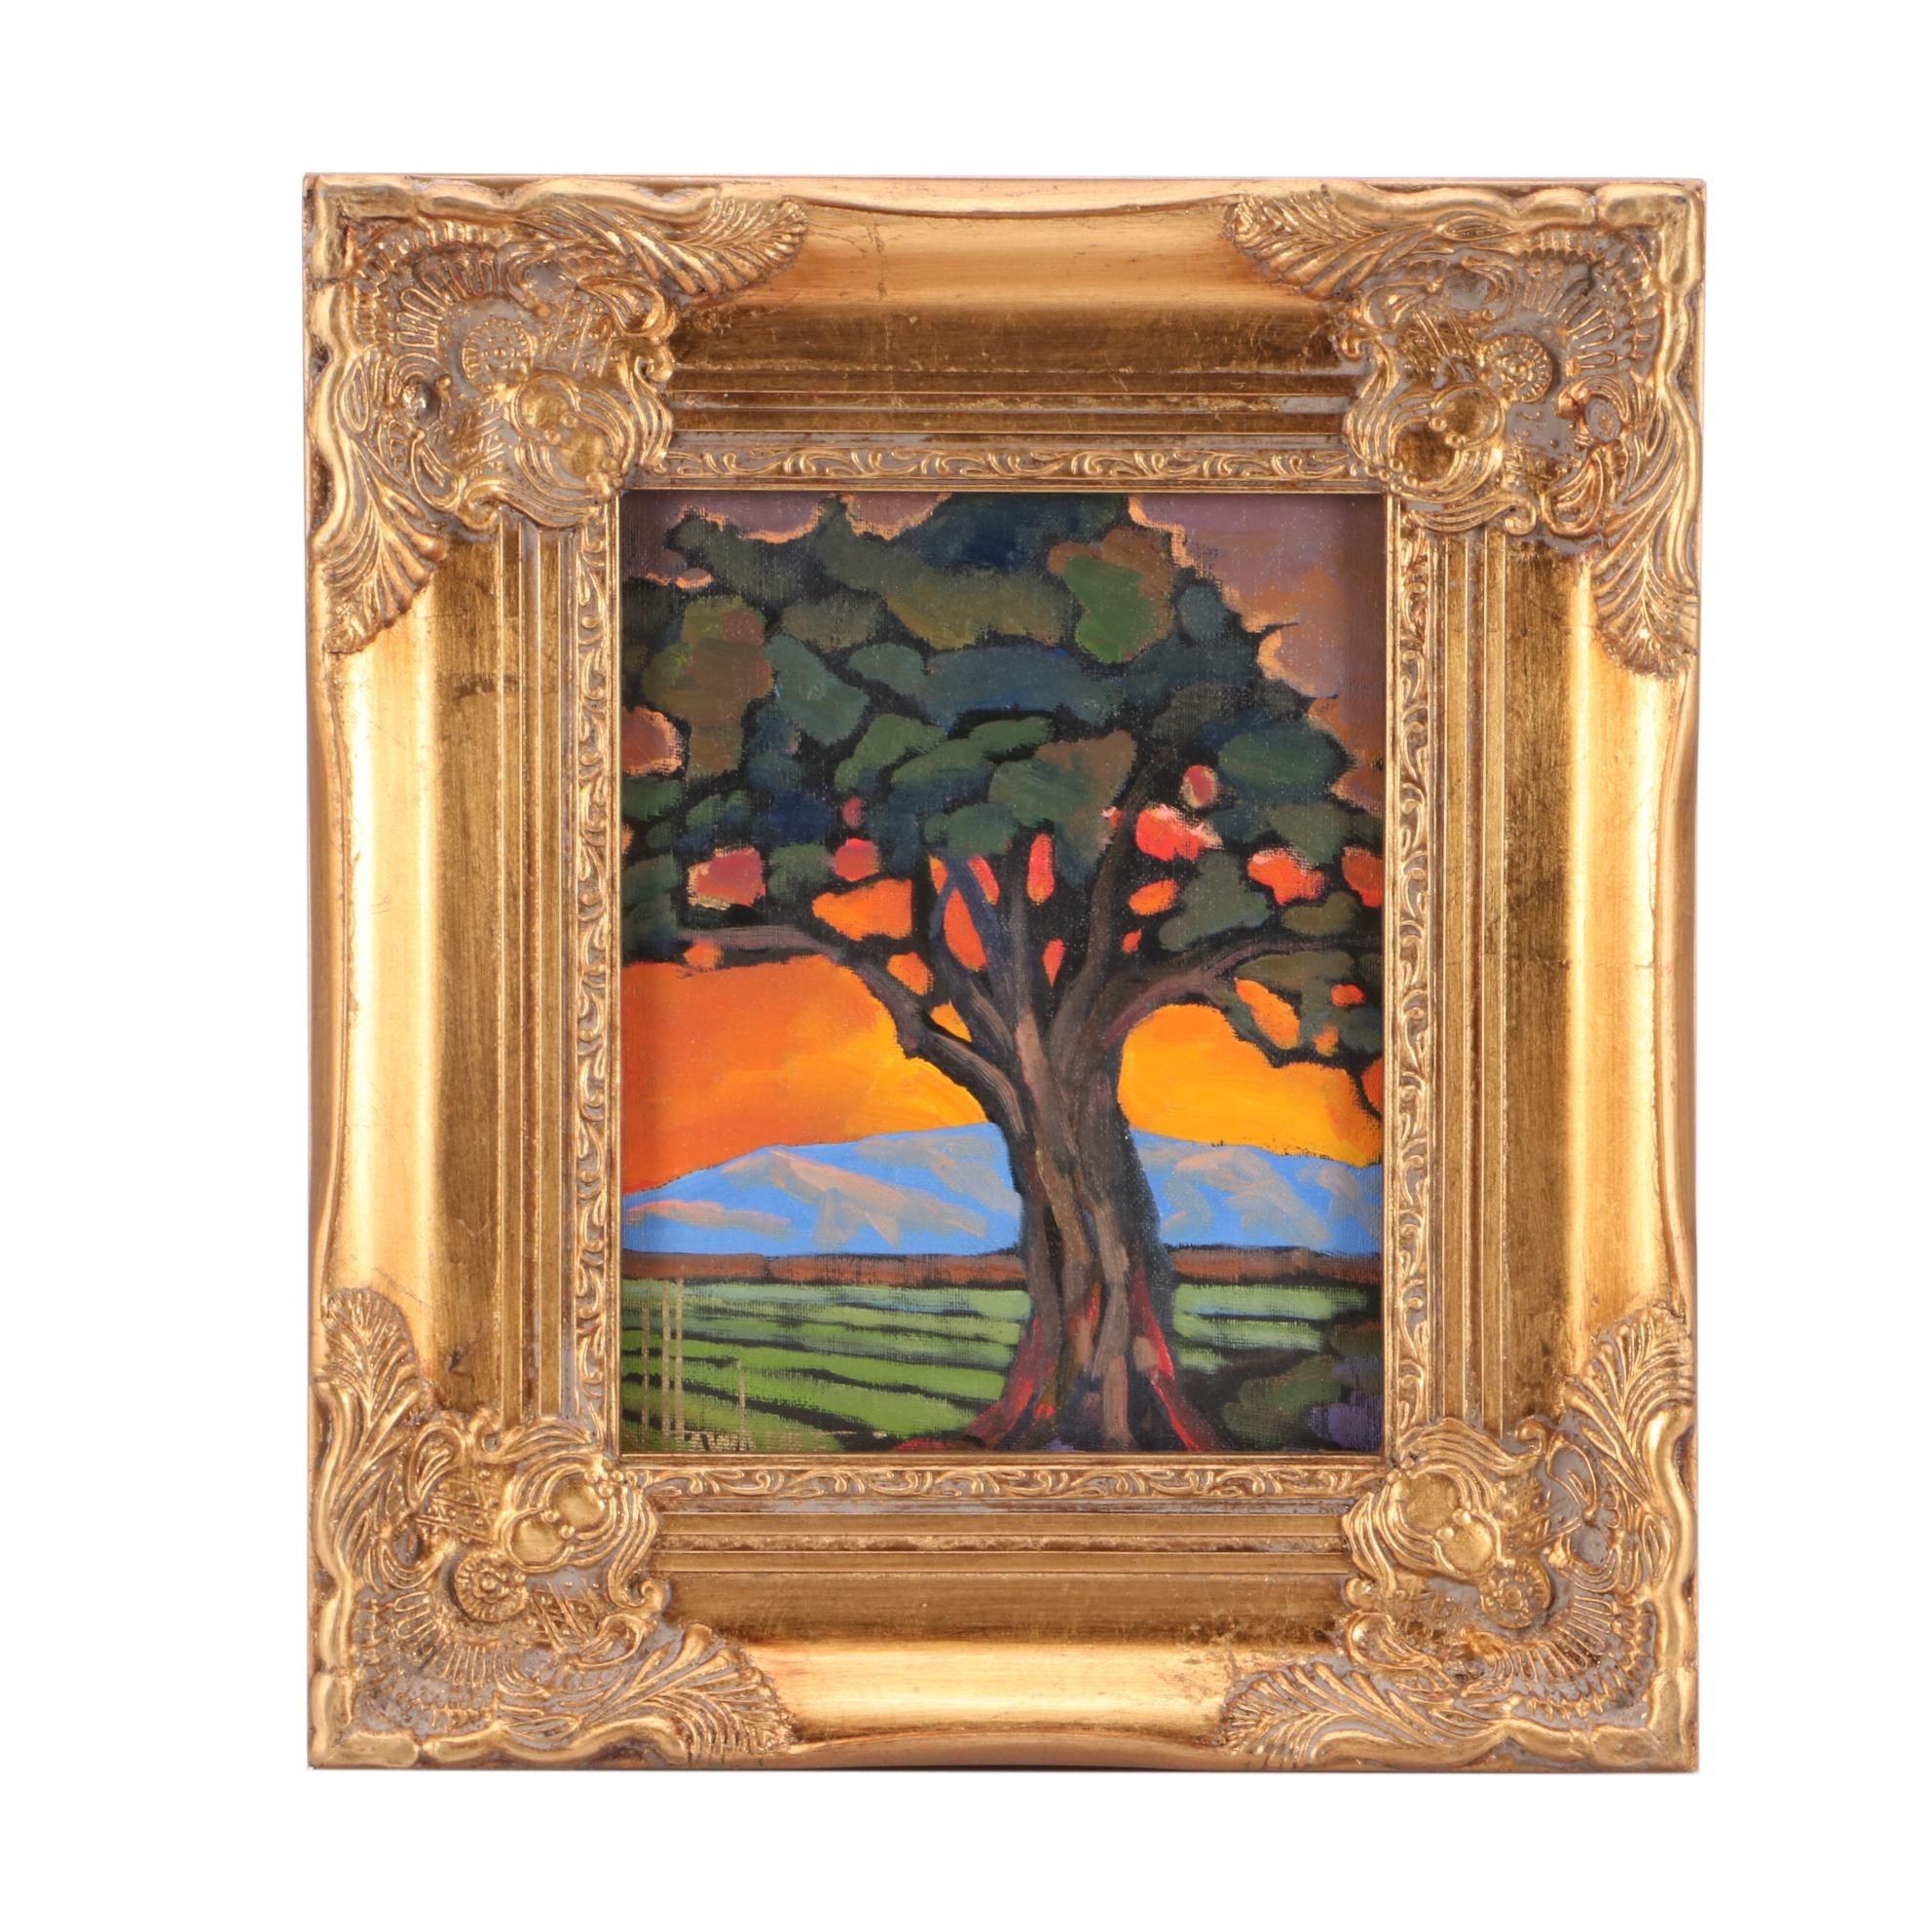 William Hawkins Contemporary Impressionist Oil Landscape Painting